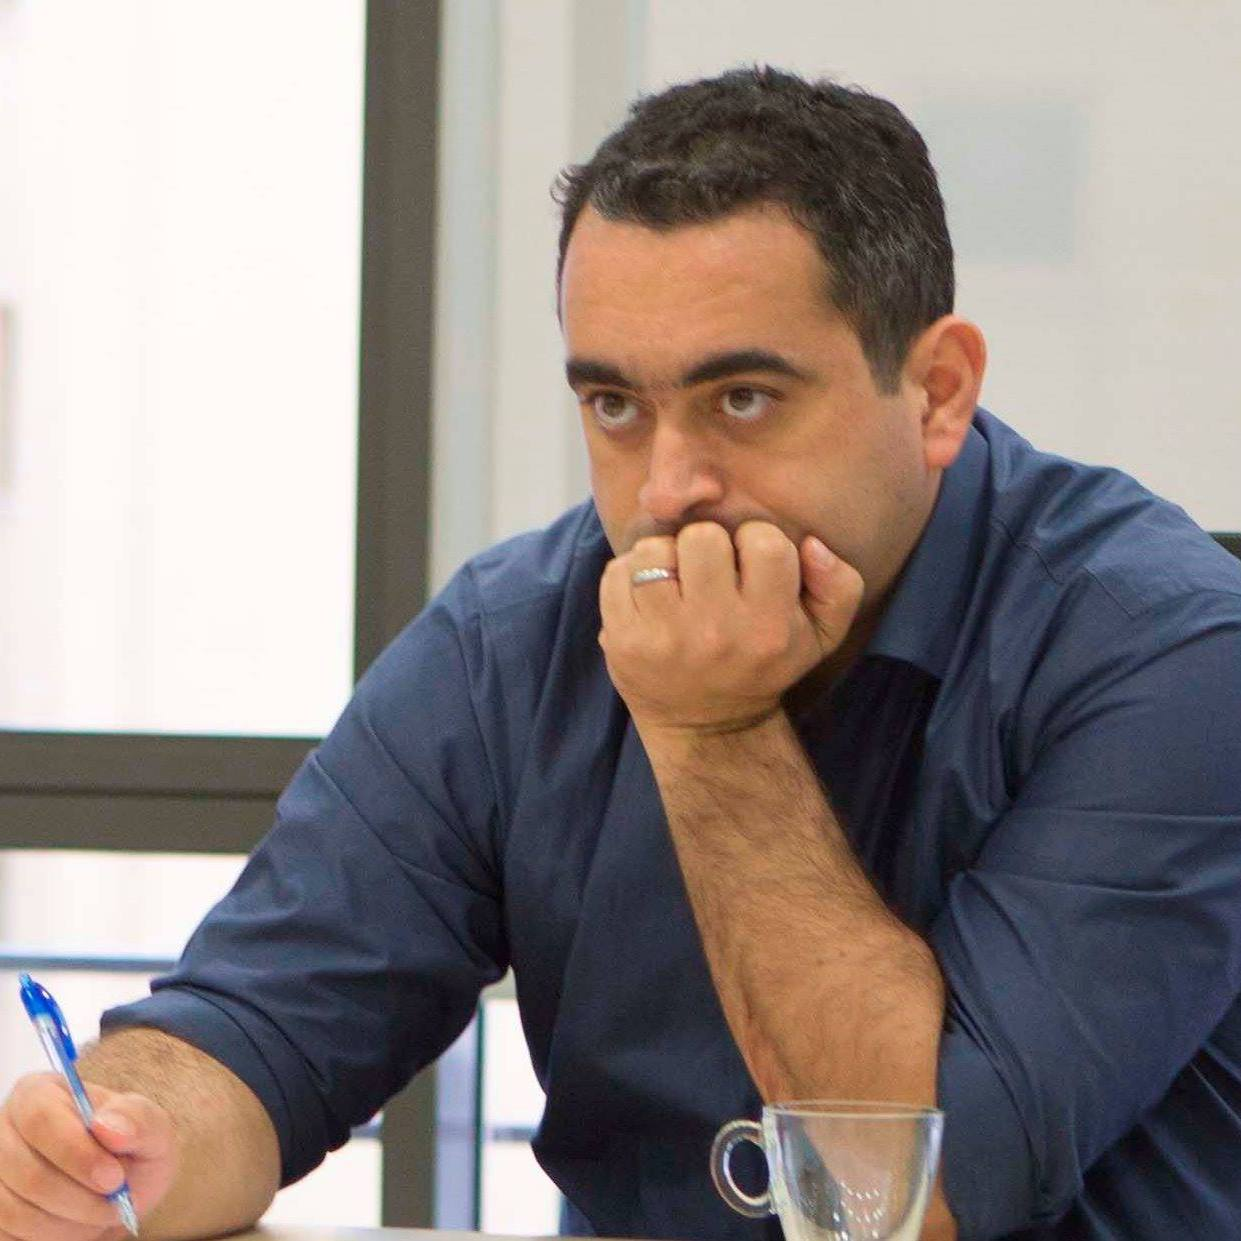 Emil Sanamyan